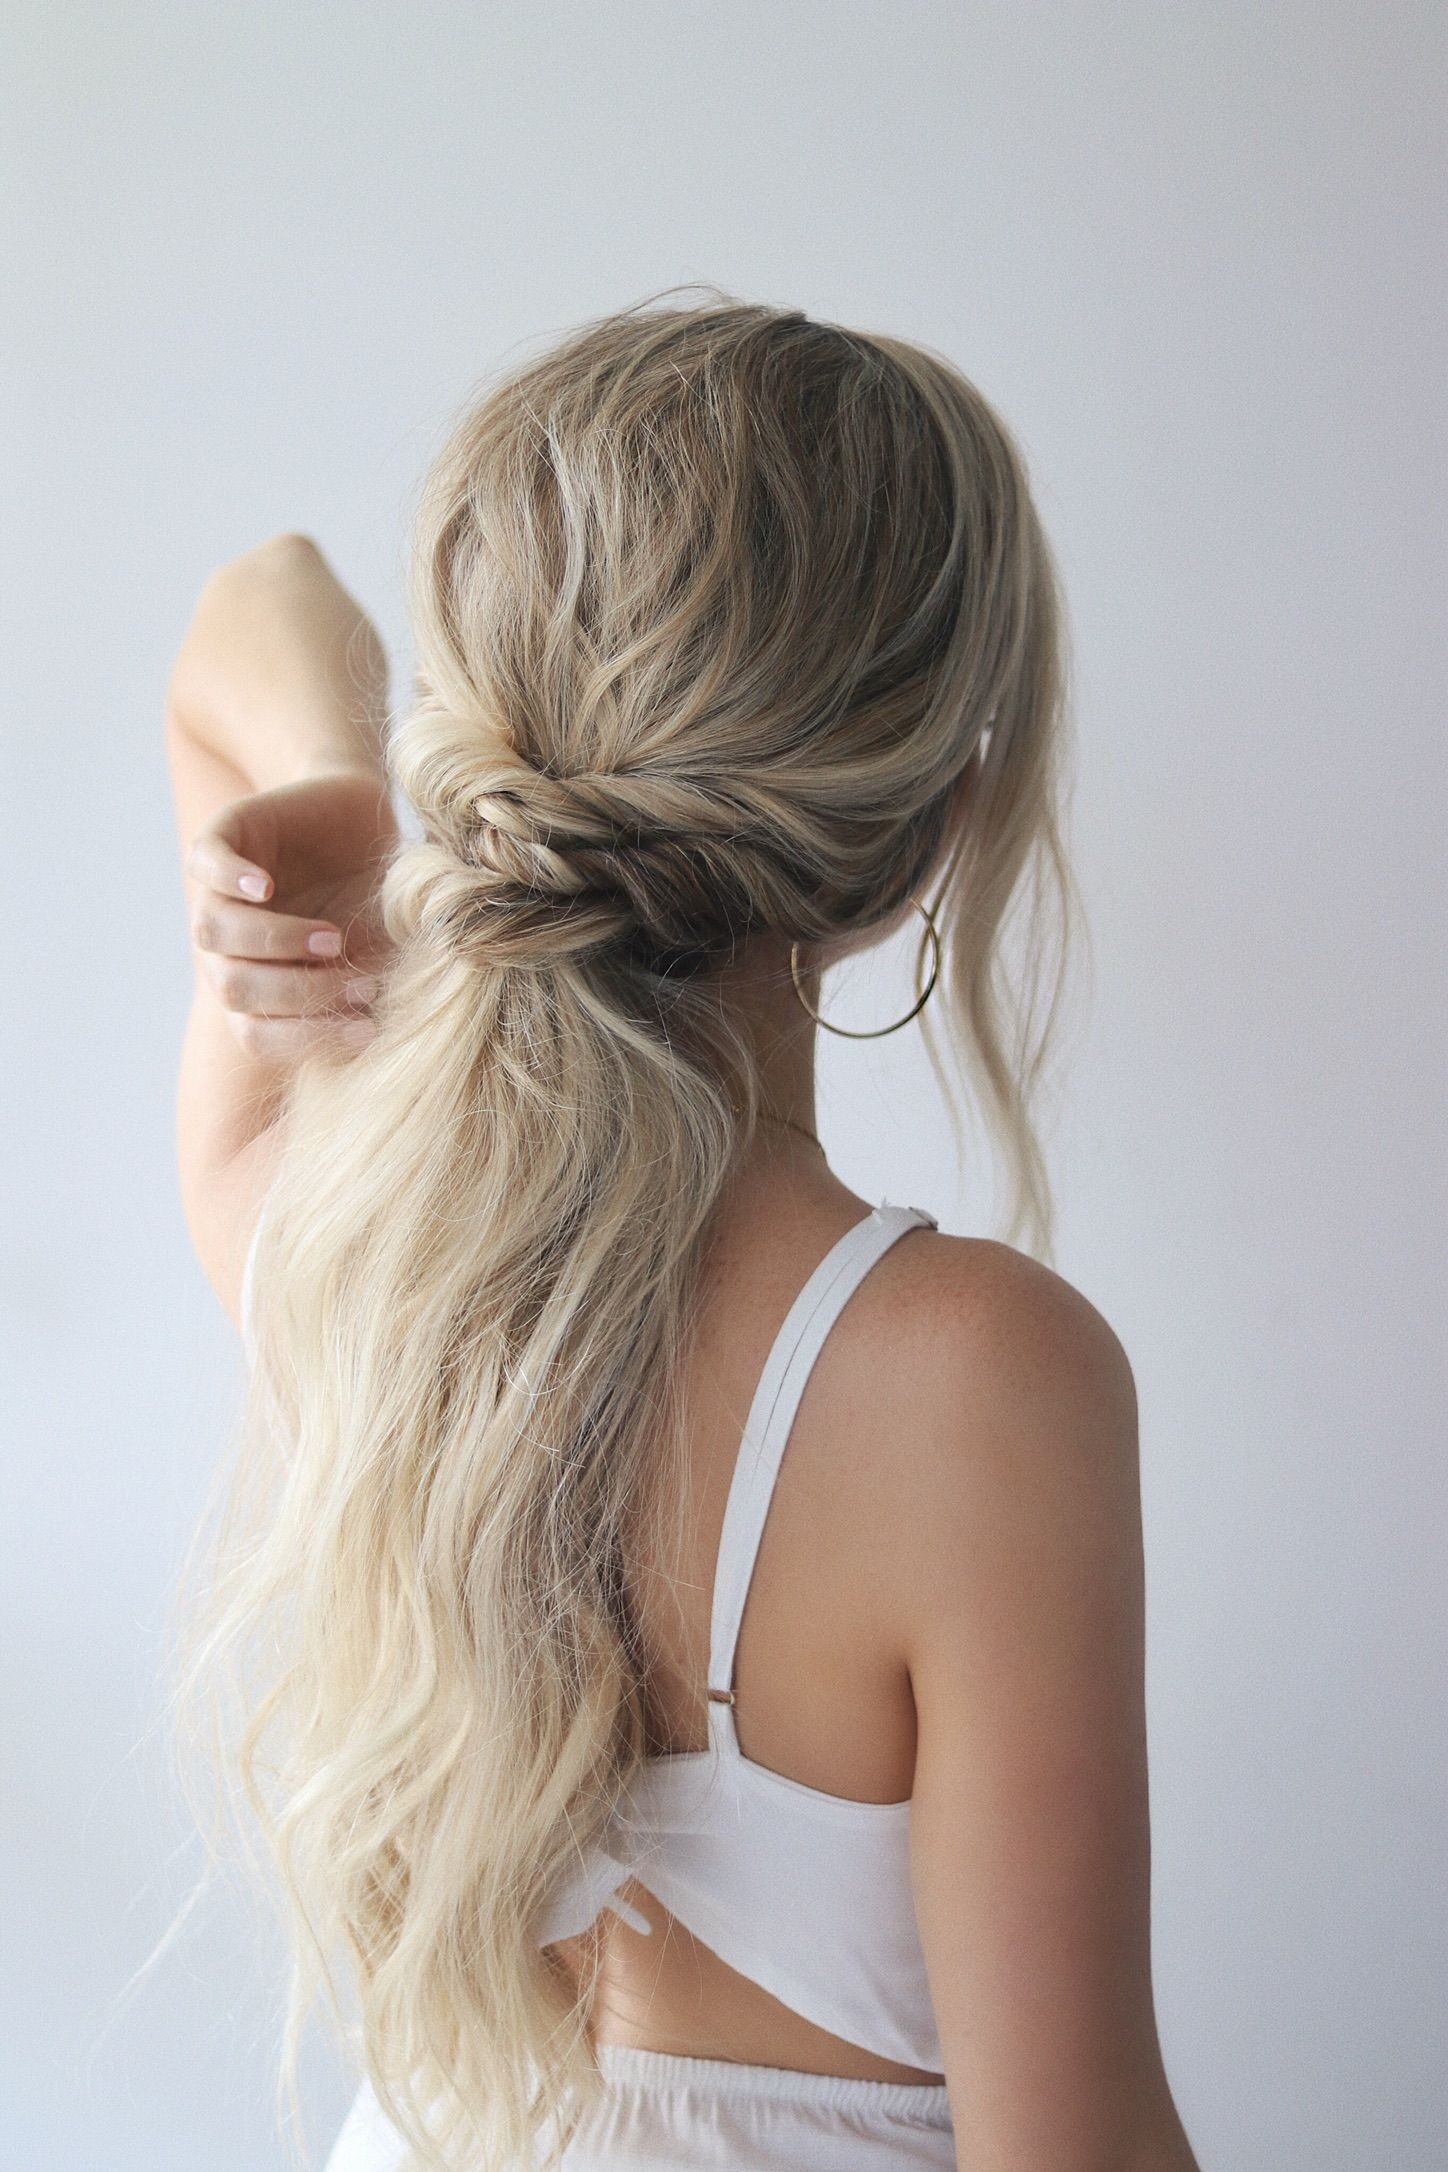 FALL HAIR TRENDS 2018 - EASY PONYTAILS HAIR TUTORIAL #hairtutorials